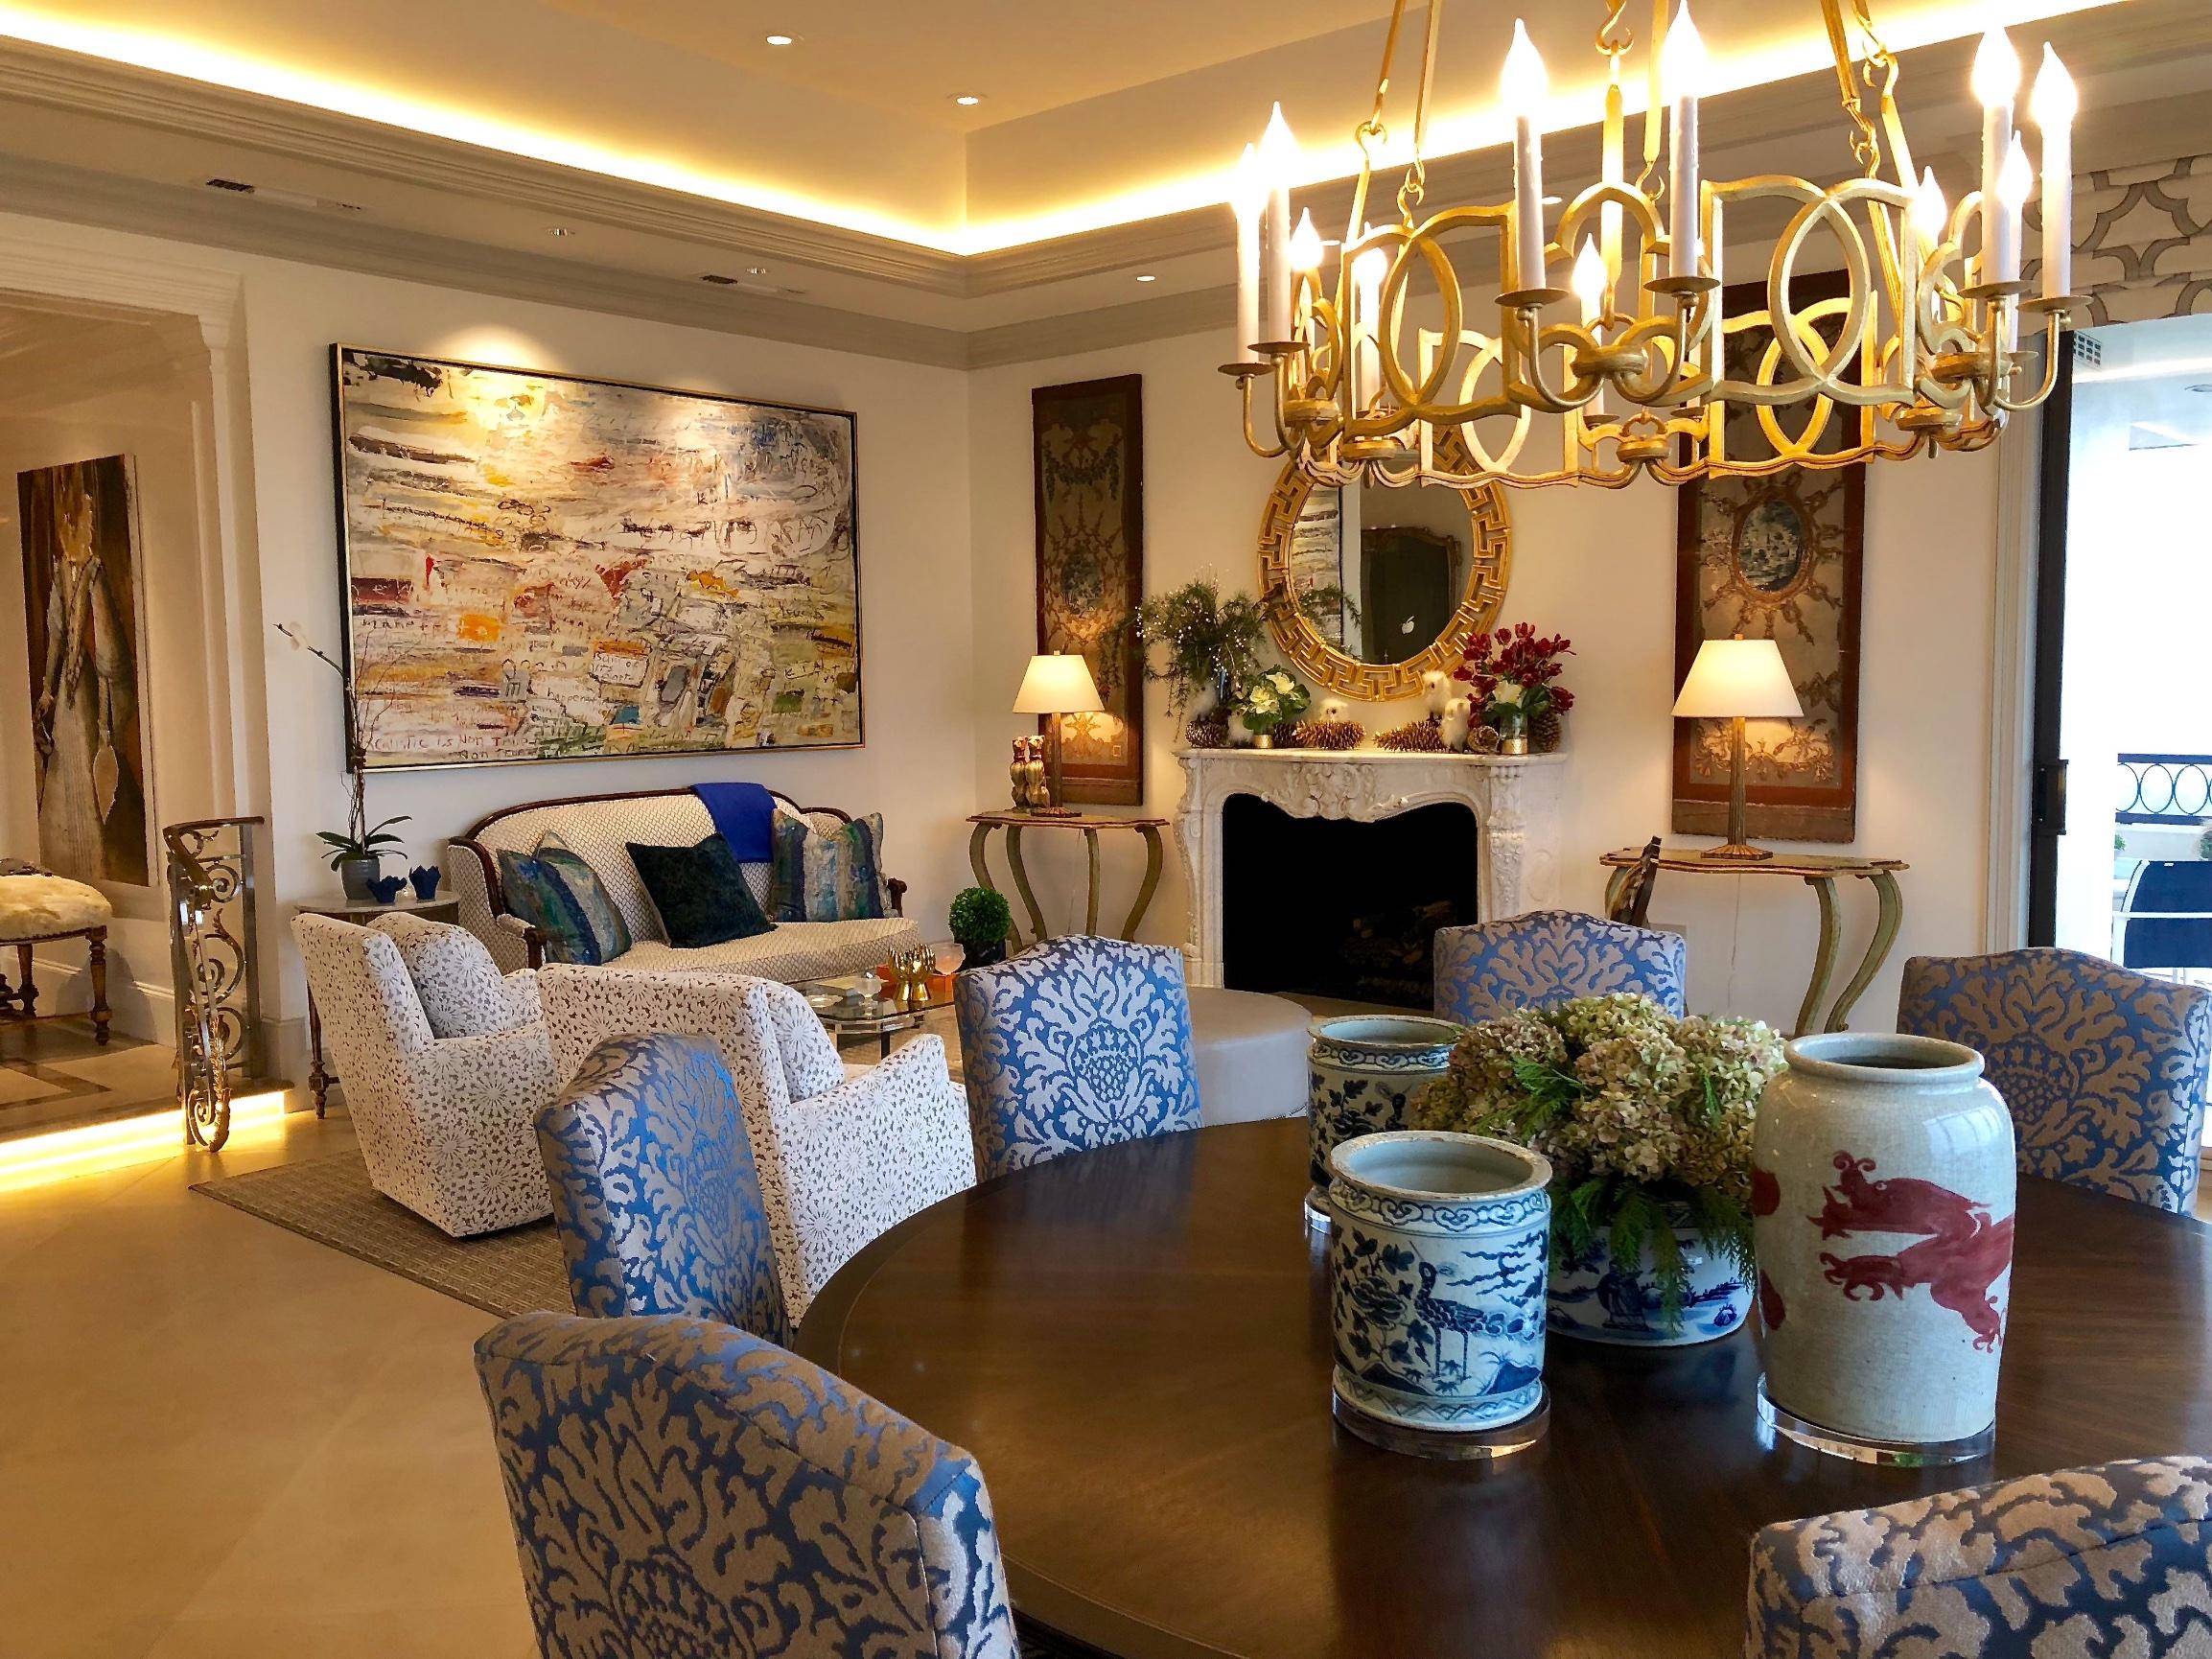 Blailock Design Is A Full Service Interior Design Firm Based In Houston,  Texas